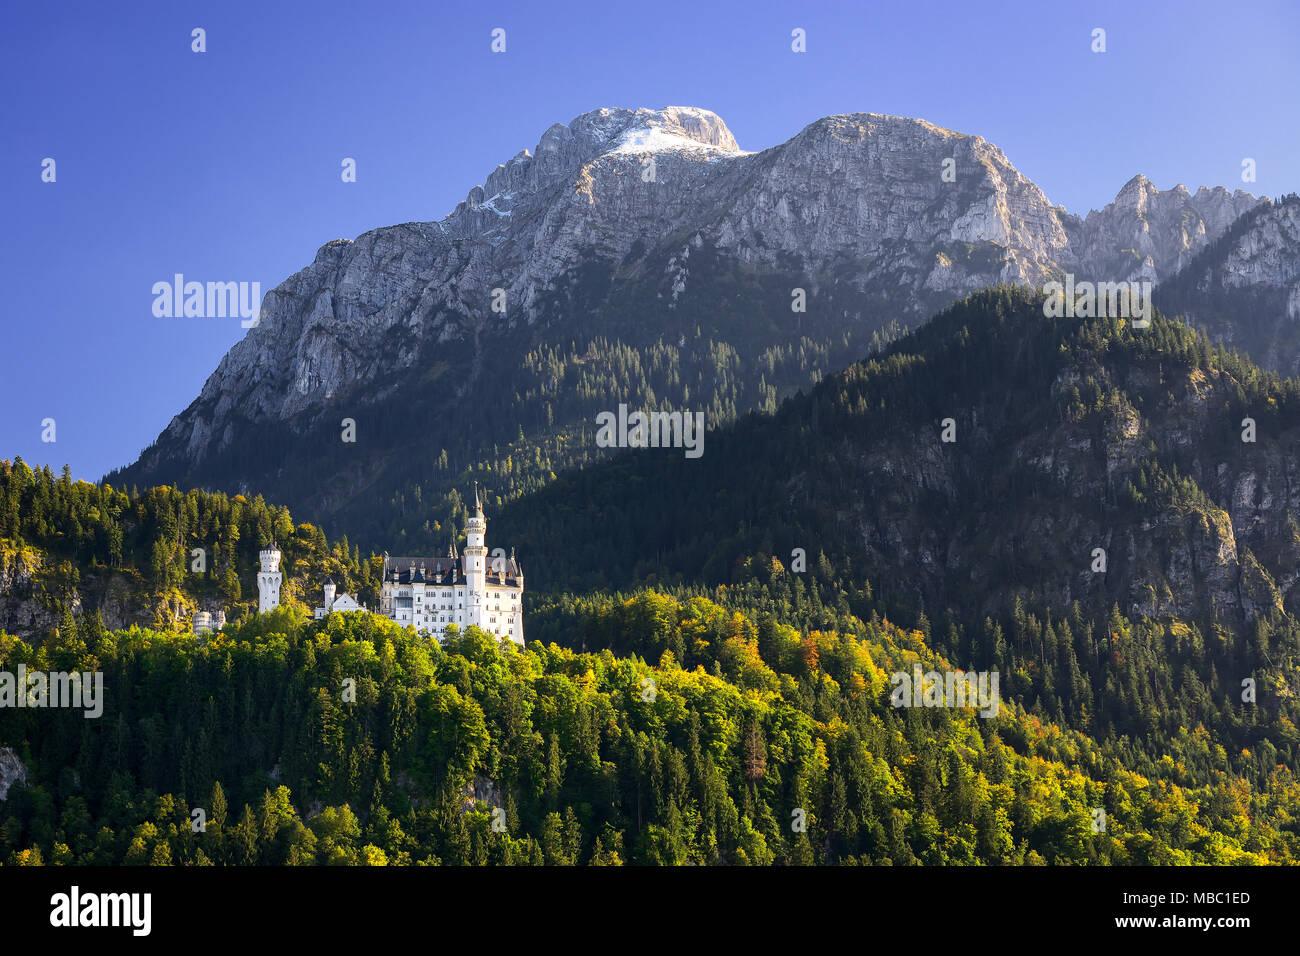 Beautiful Neuschwanstein Castle with scenic mountain landscape near Fussen, Bavaria, Germany - Stock Image